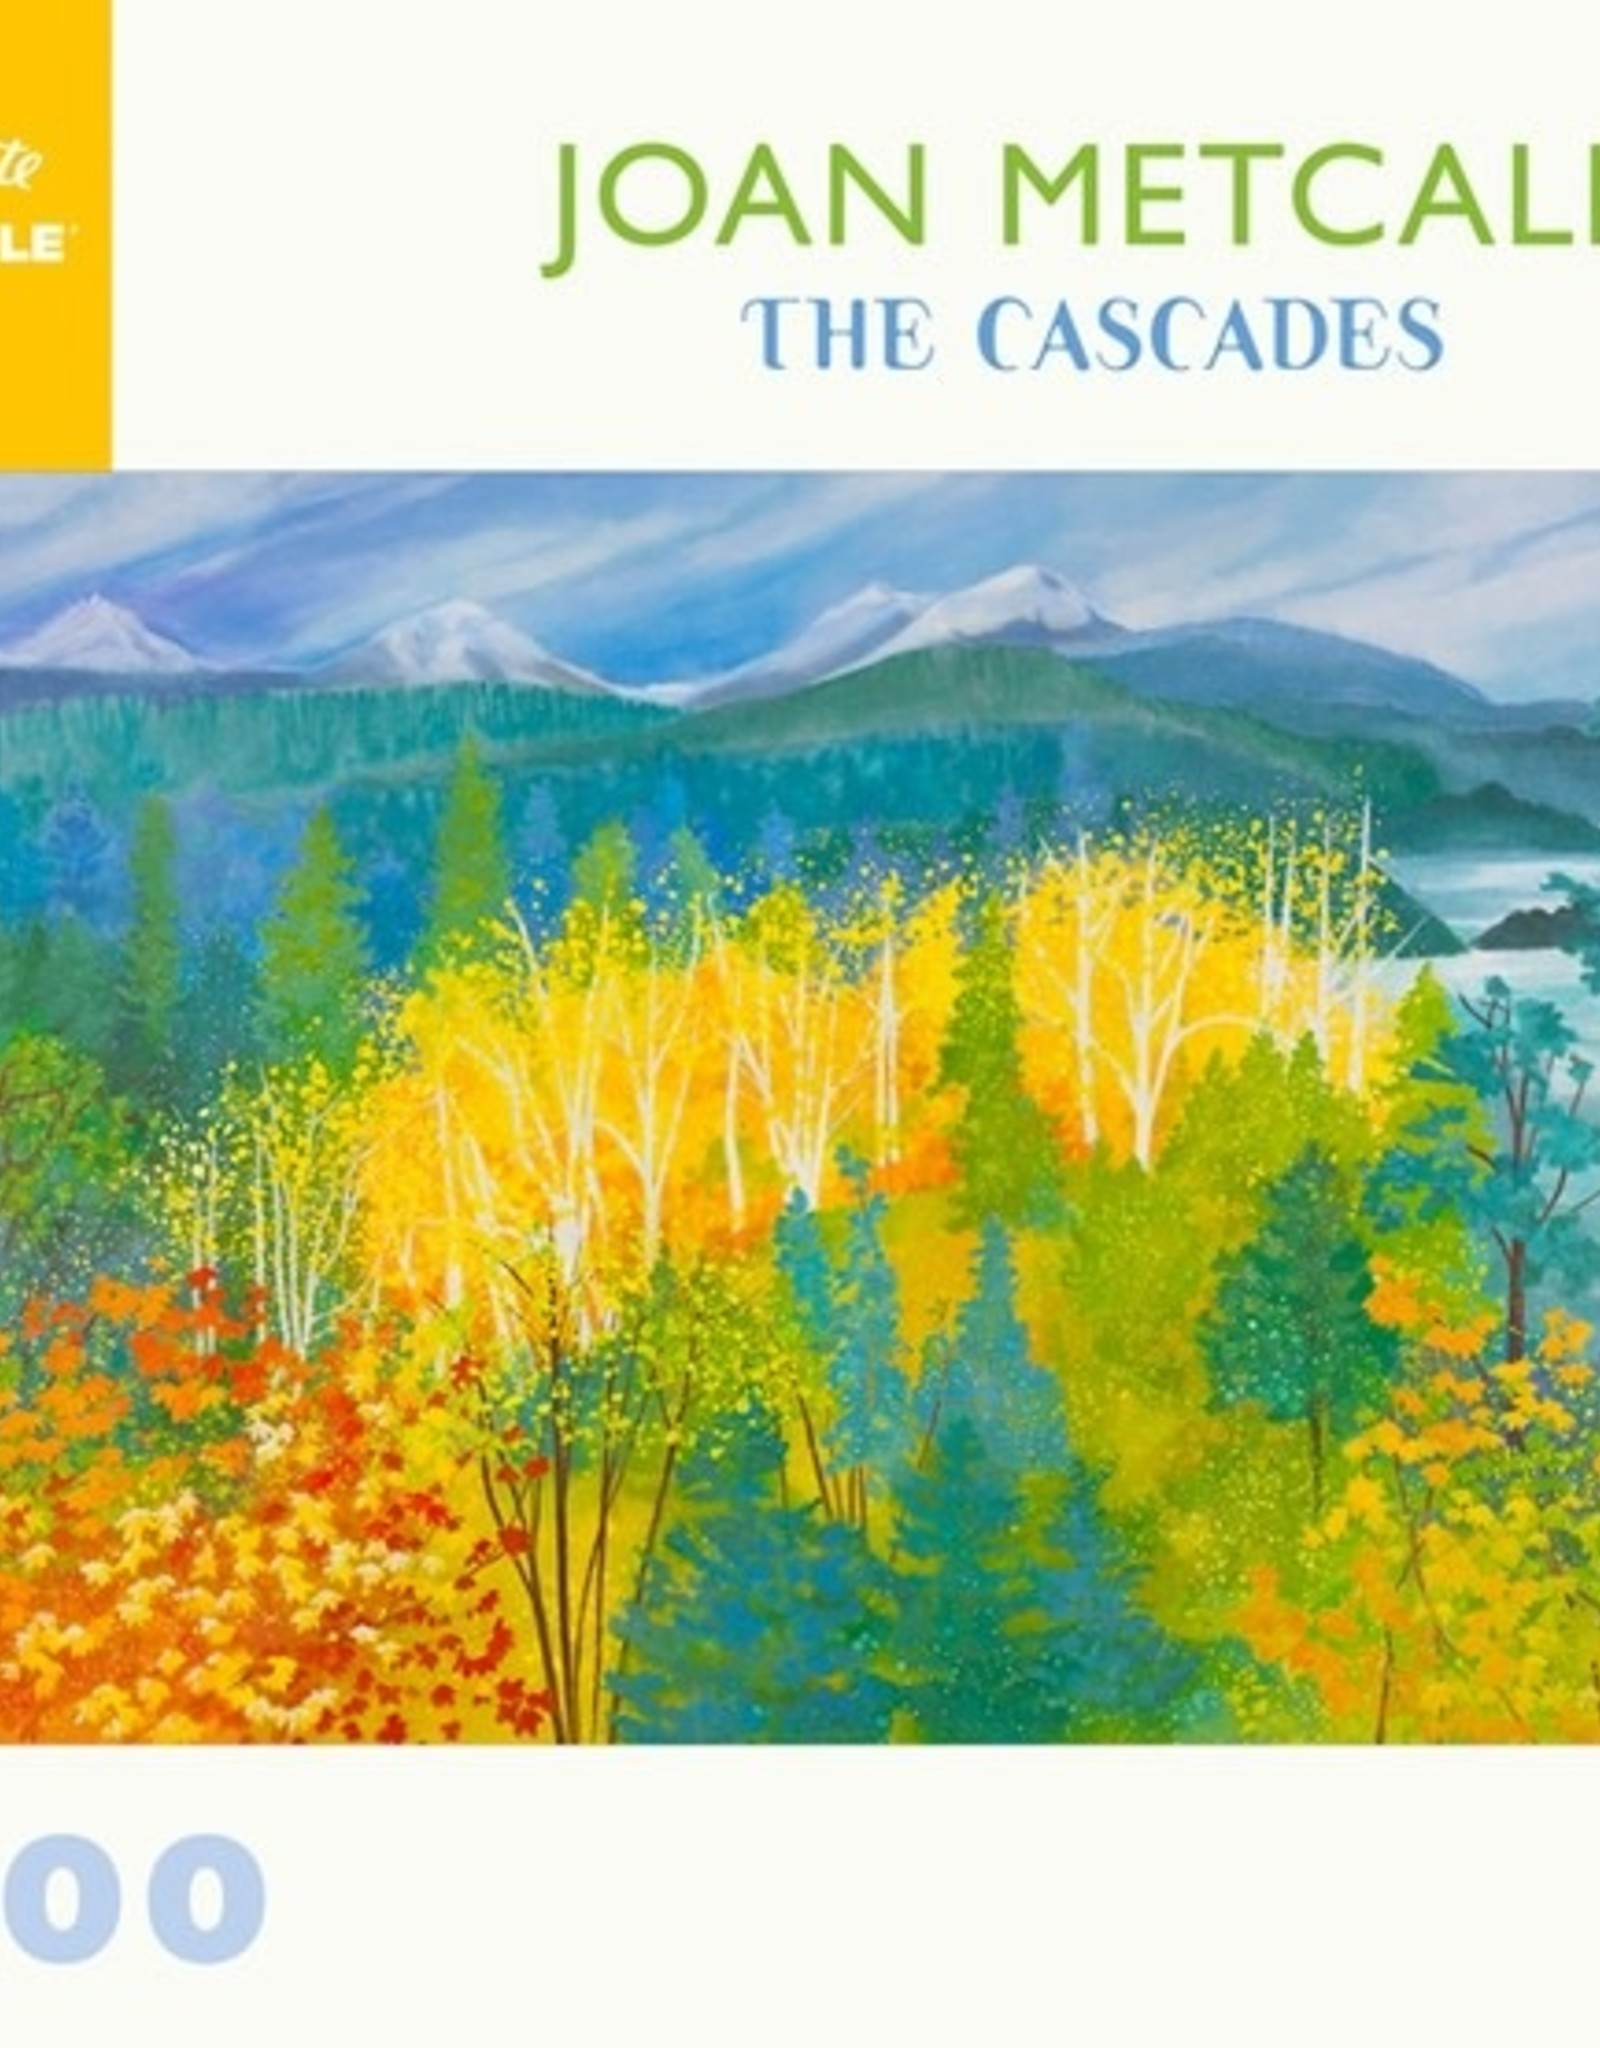 Pomegranate 1000 pc Joan Metcalf: The Cascades Puzzle